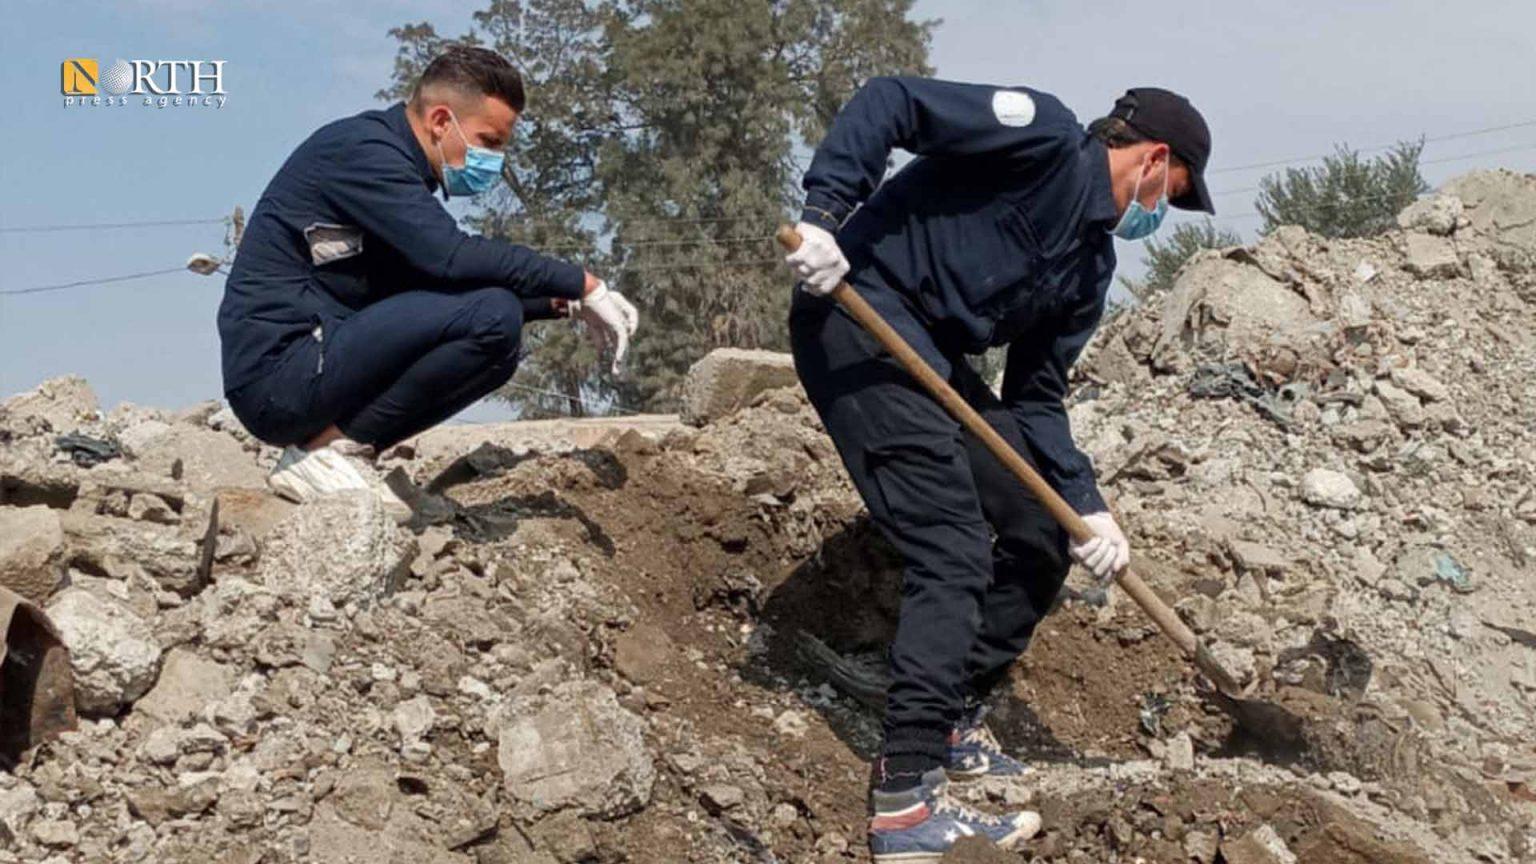 The Initial Response Team retrieves an unidentified body in Raqqa